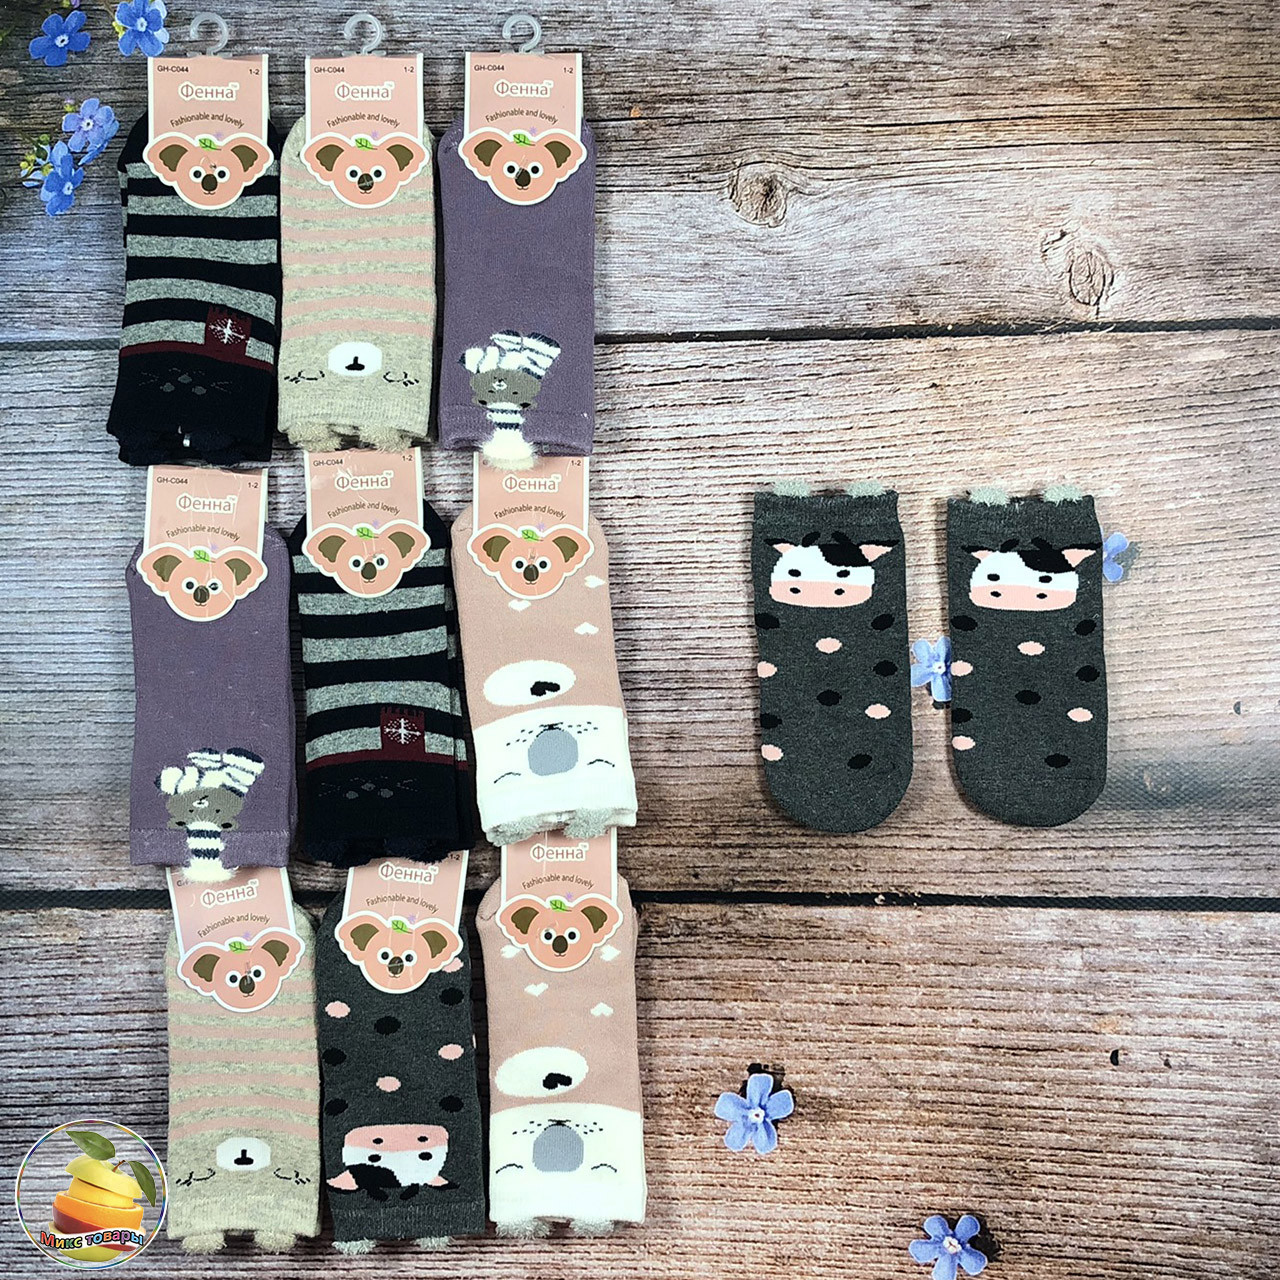 Тёплые детские носочки Размер: 5- 6 лет (20822-3)